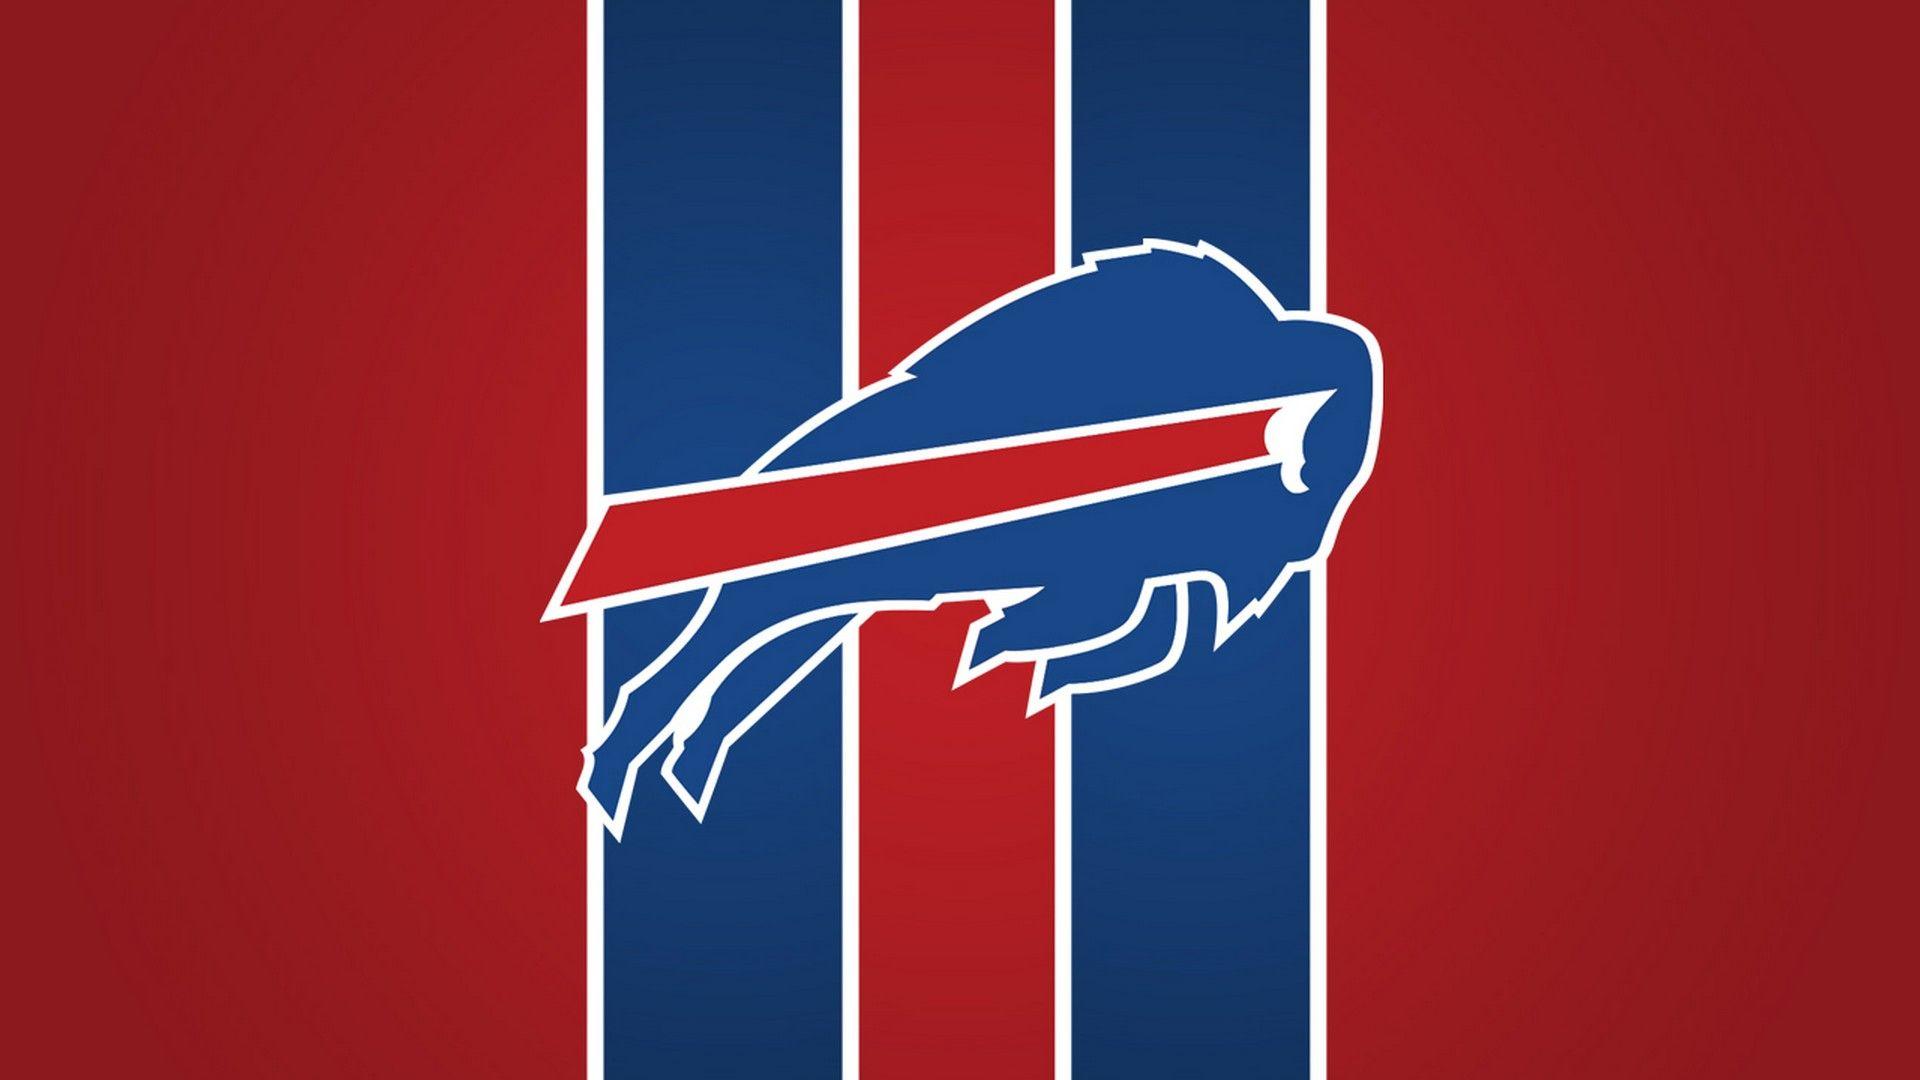 Buffalo Bills For Desktop Wallpaper 2021 Nfl Football Wallpapers Buffalo Bills Buffalo Bills Logo Buffalo Bills Stuff